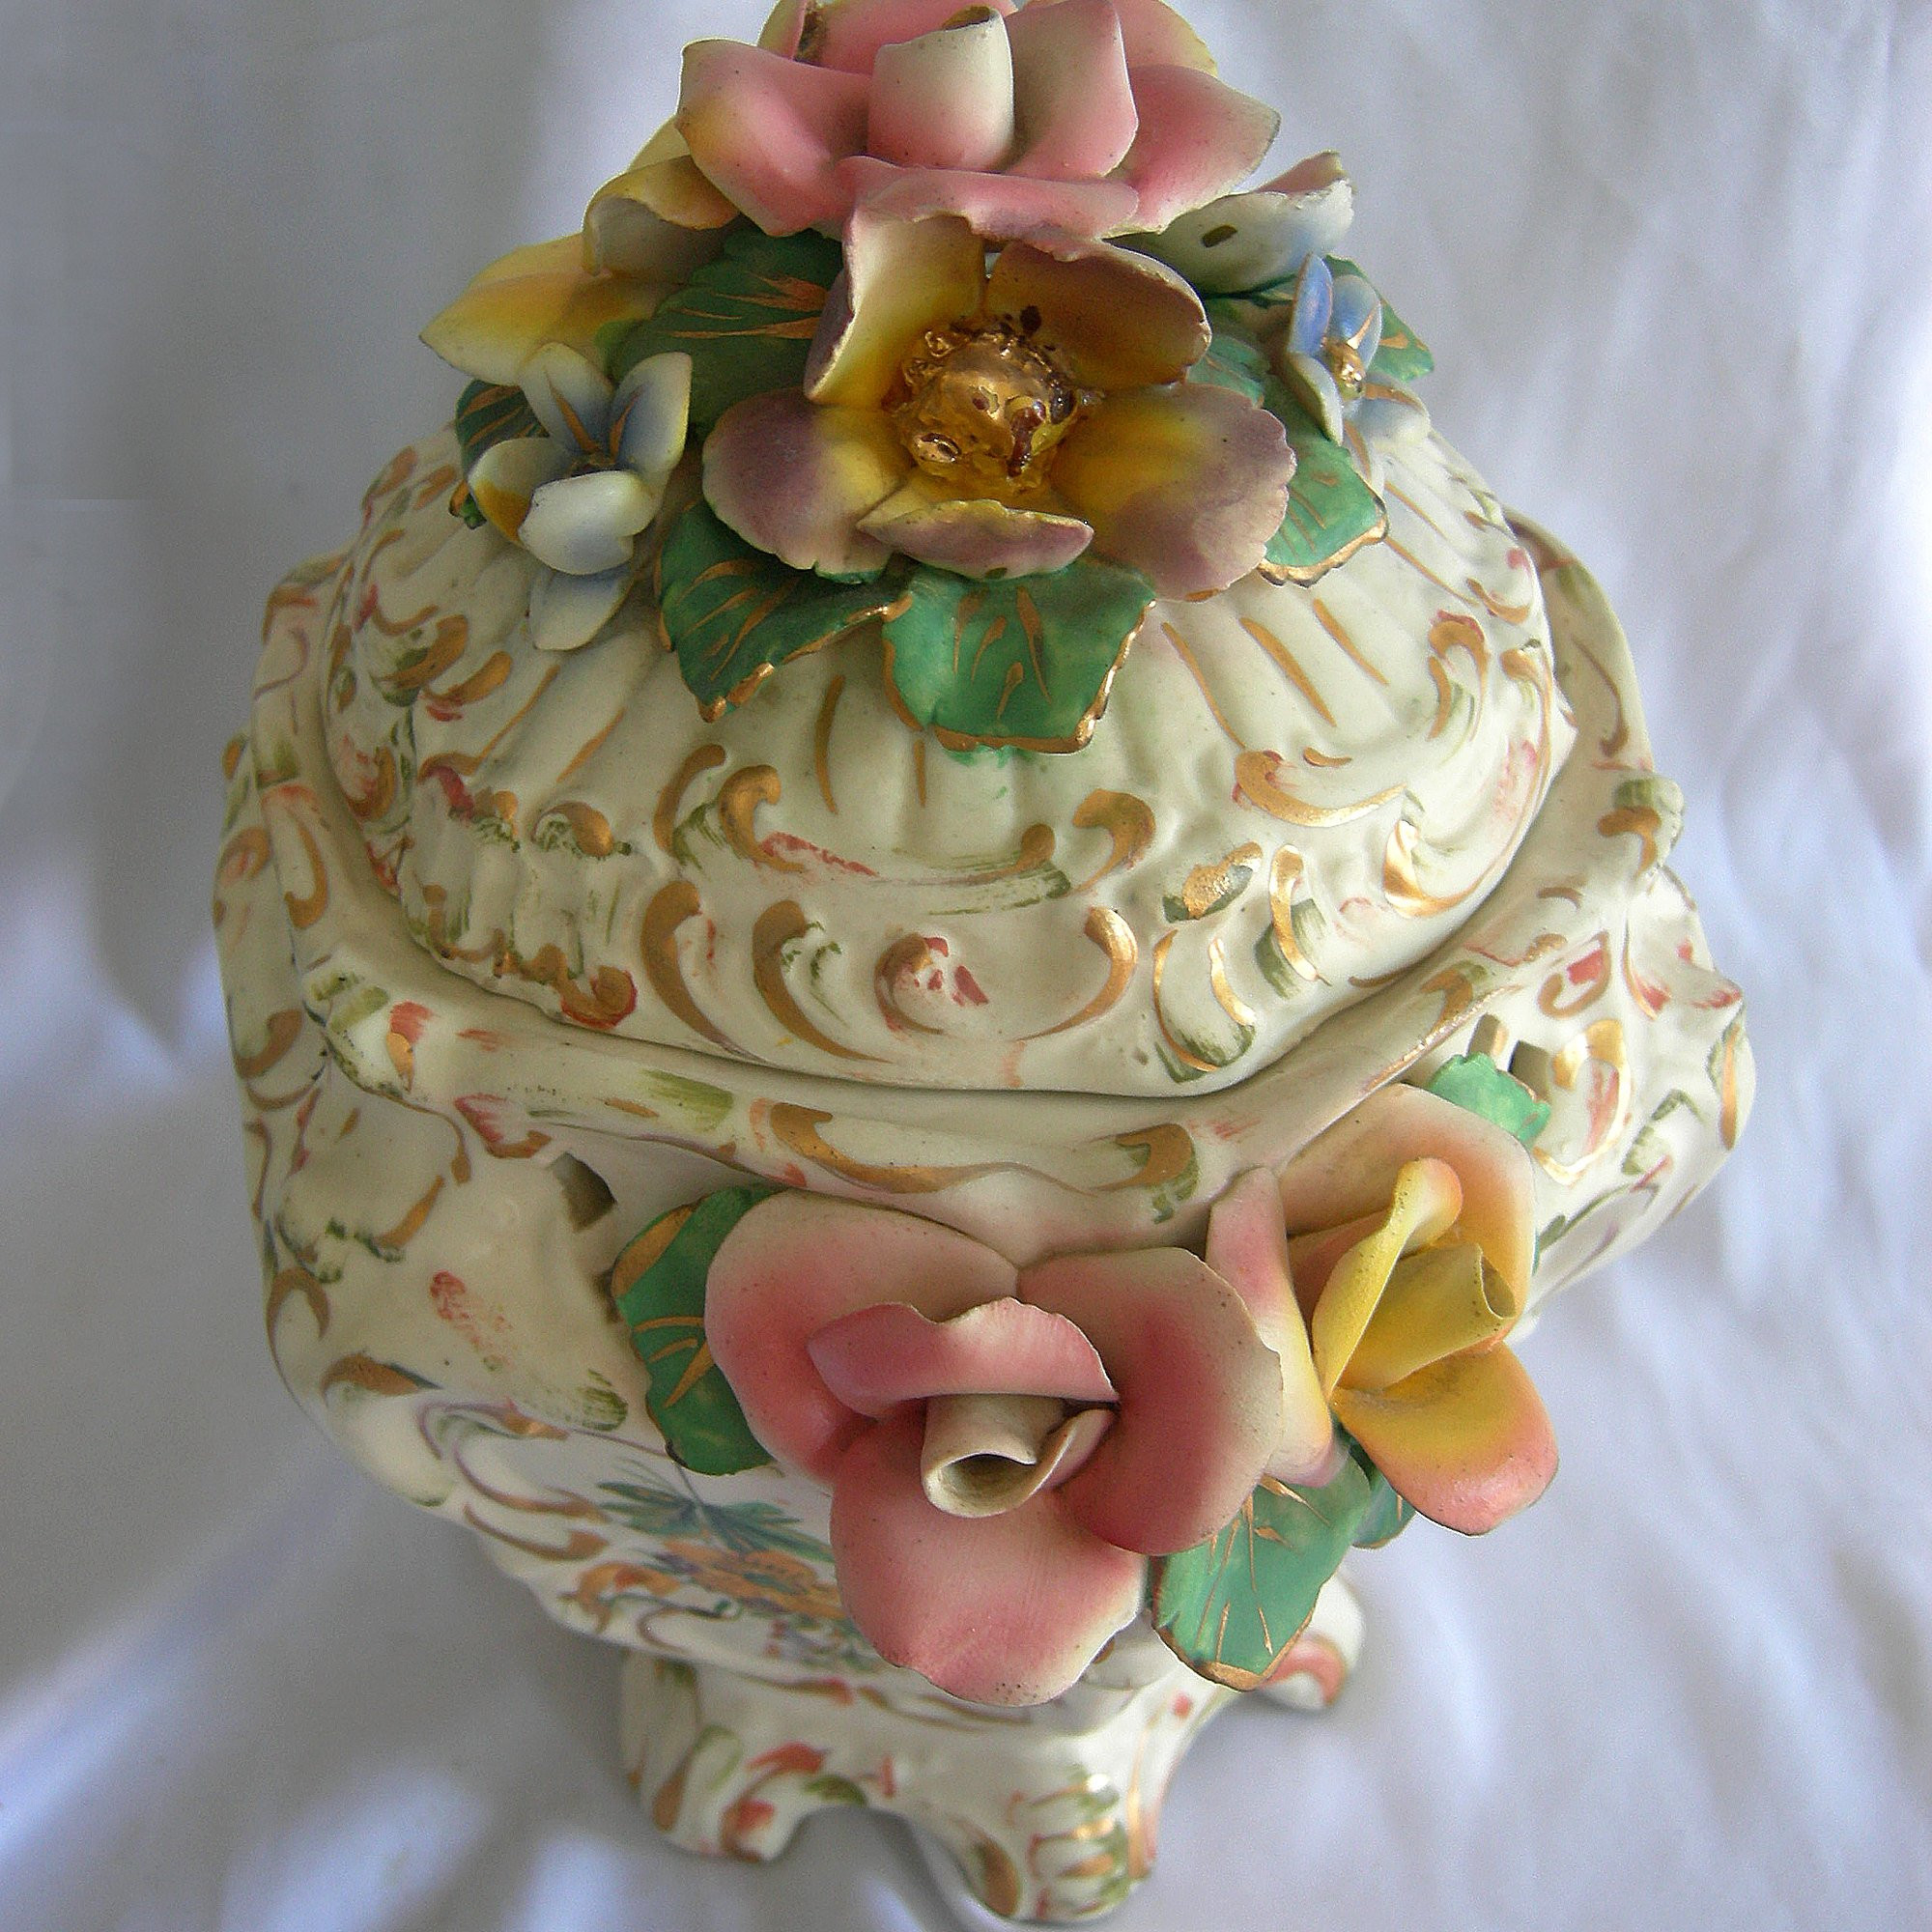 white fenton glass vase of white milk glass hobnail bud vase fenton vintage etsy throughout retrofitgallery